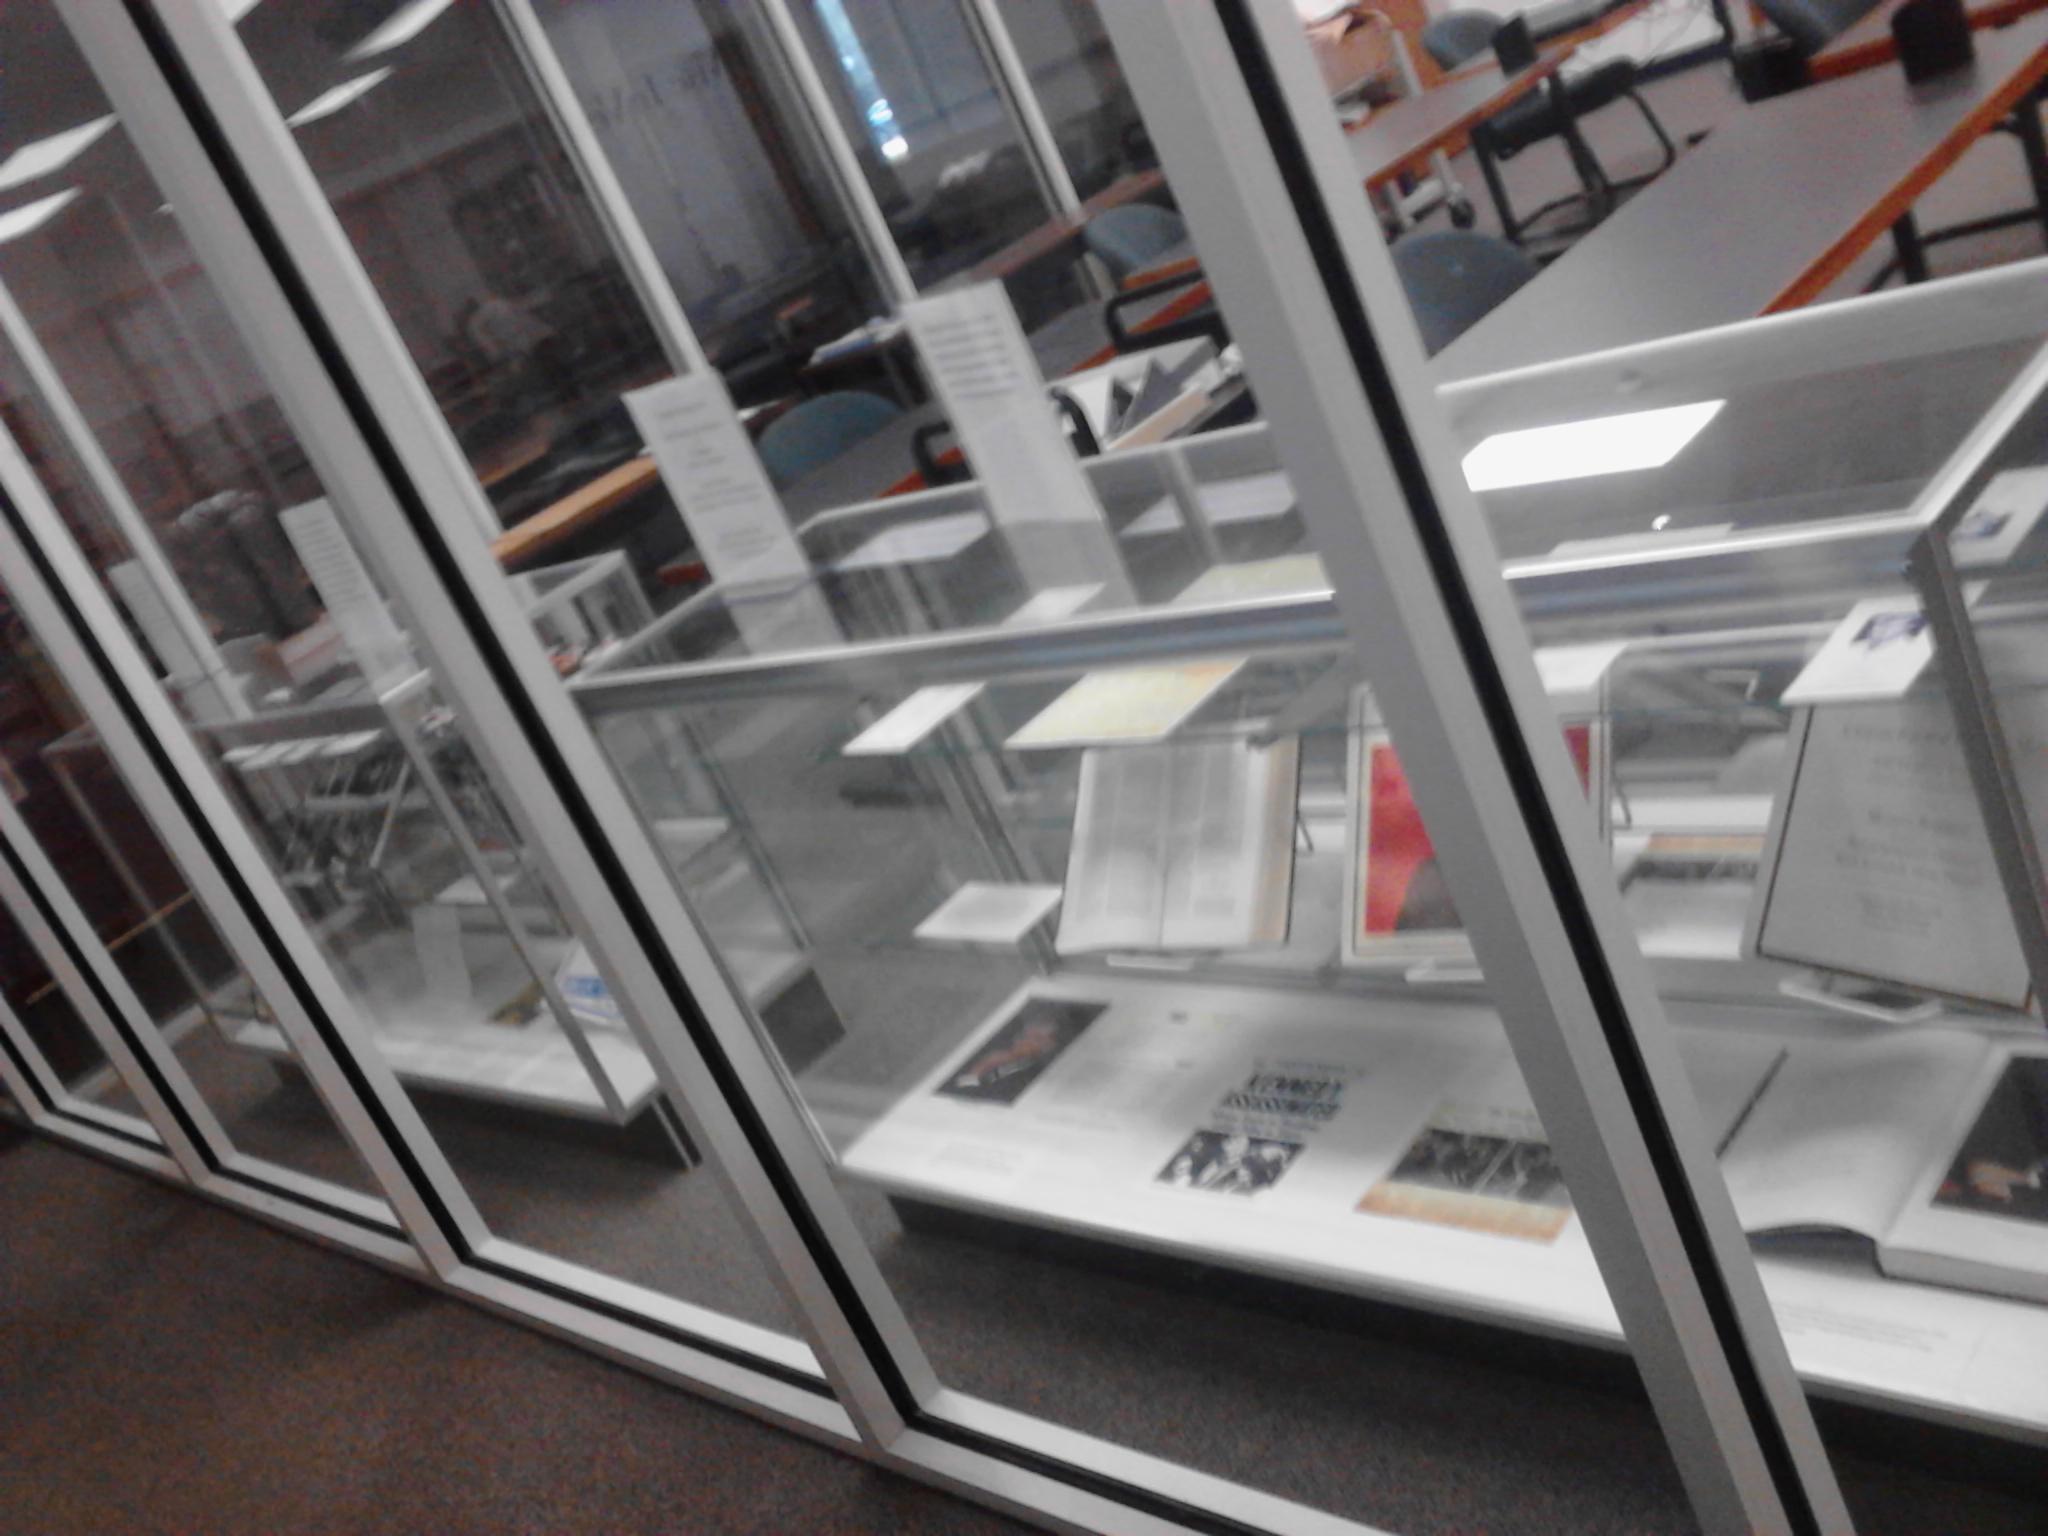 Exhibit on JFK in Archives Reading Room